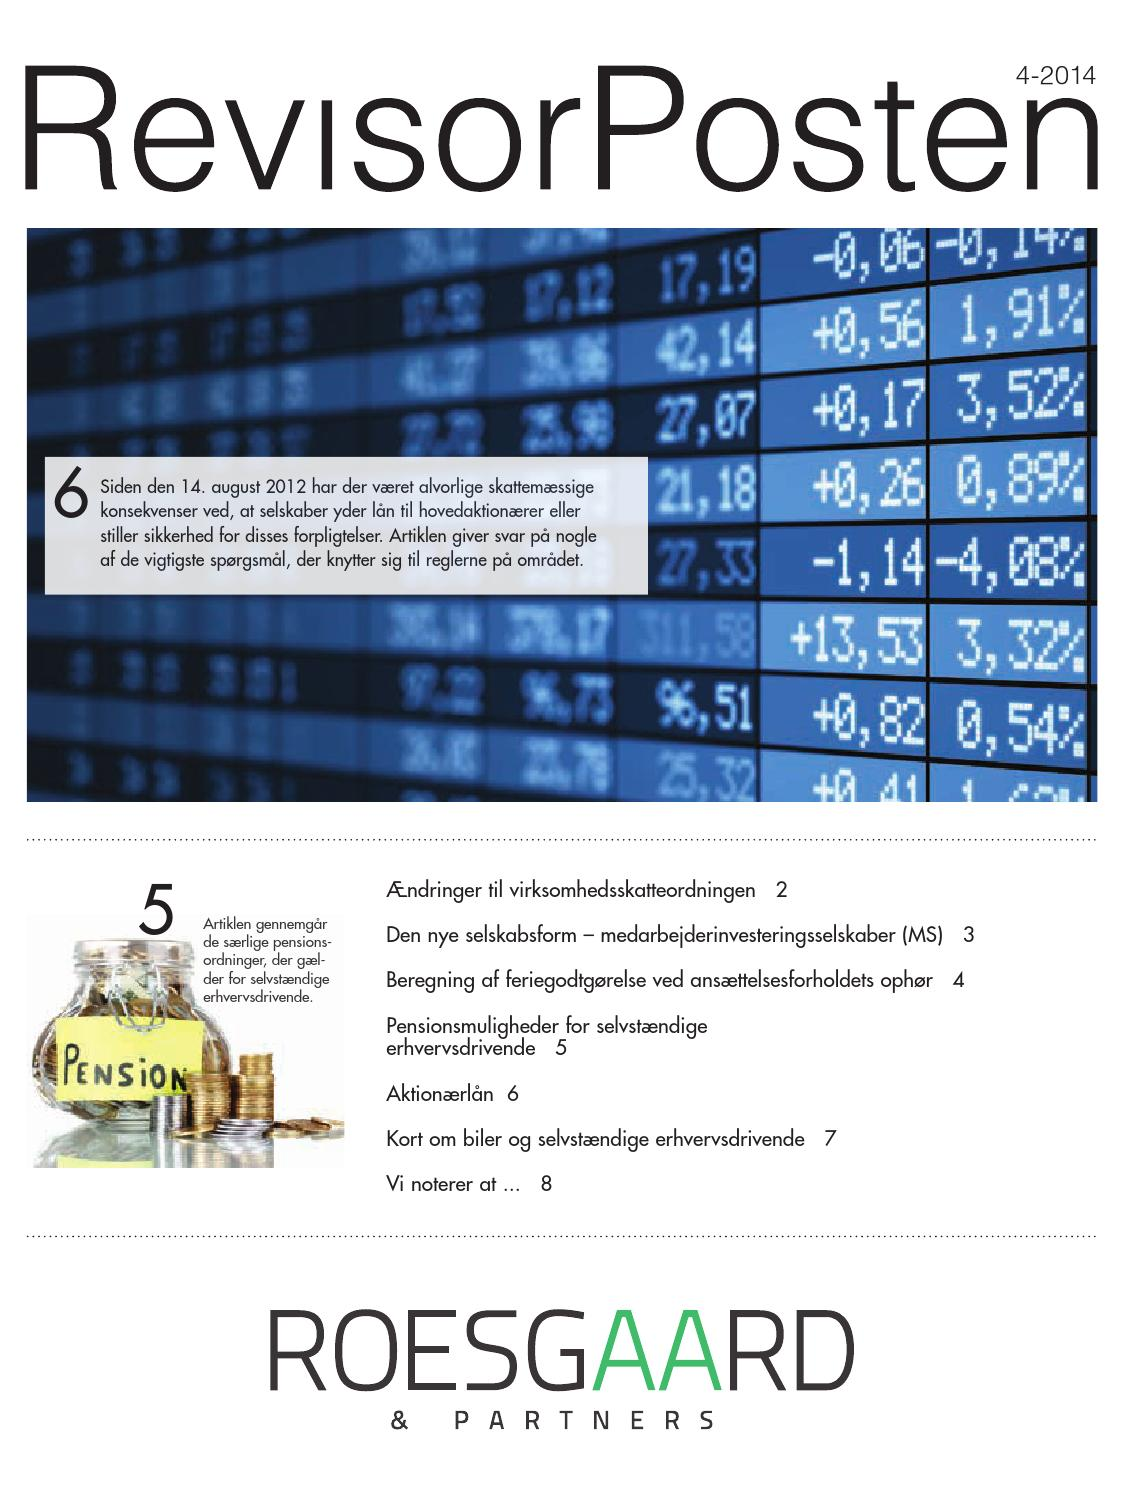 Revisorposten, 4 kvt 2014 by Roesgaard & Partners - Issuu